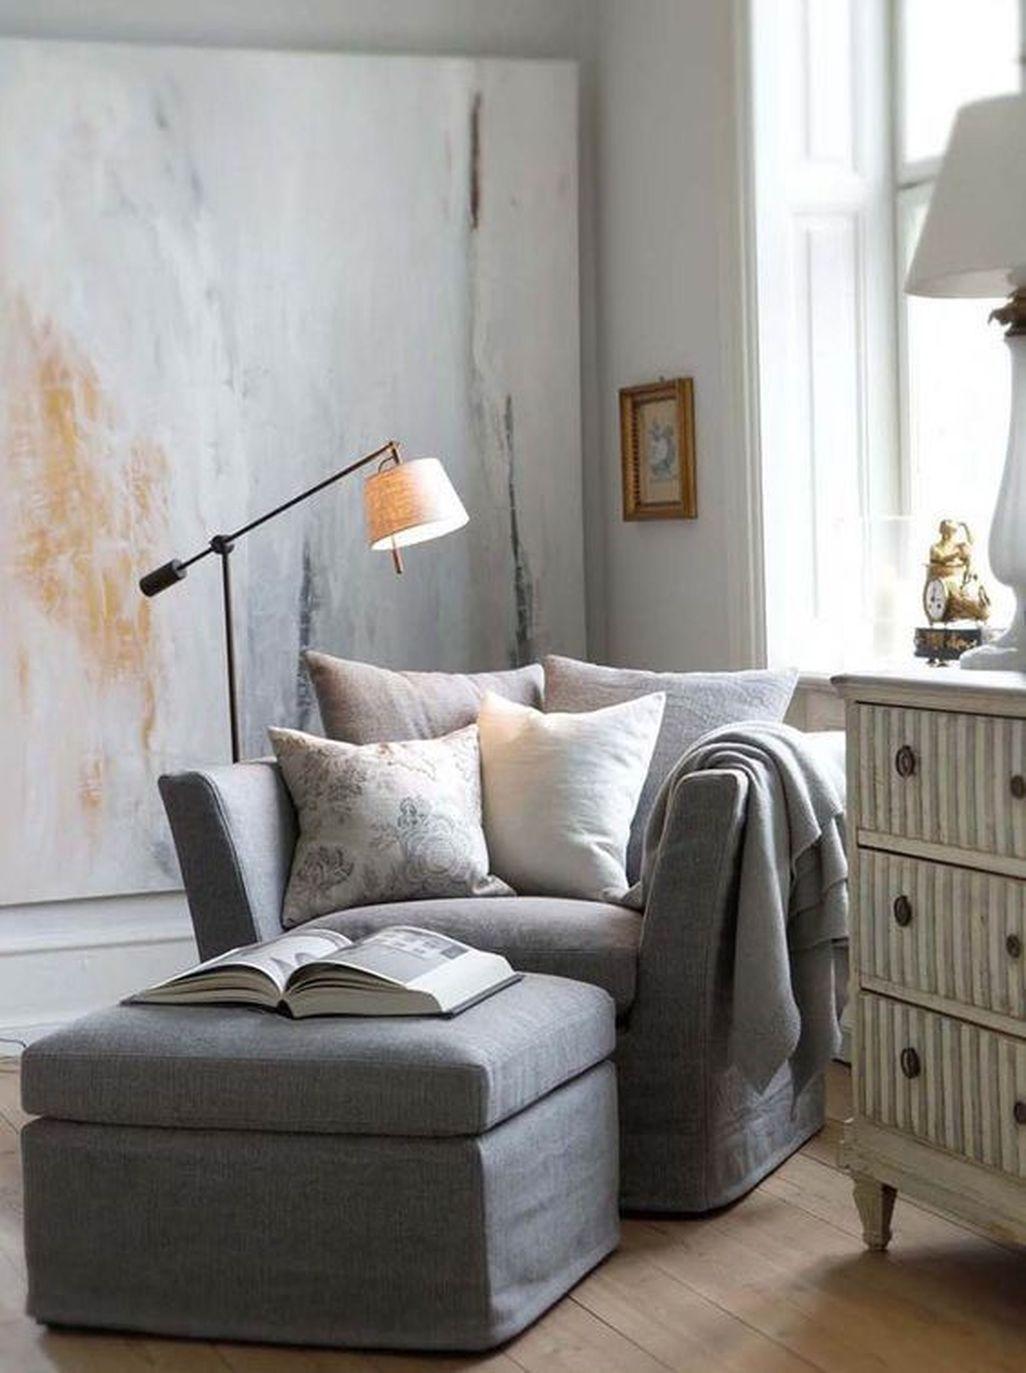 Inspiring Corner Fireplace Ideas In The Living Room 01